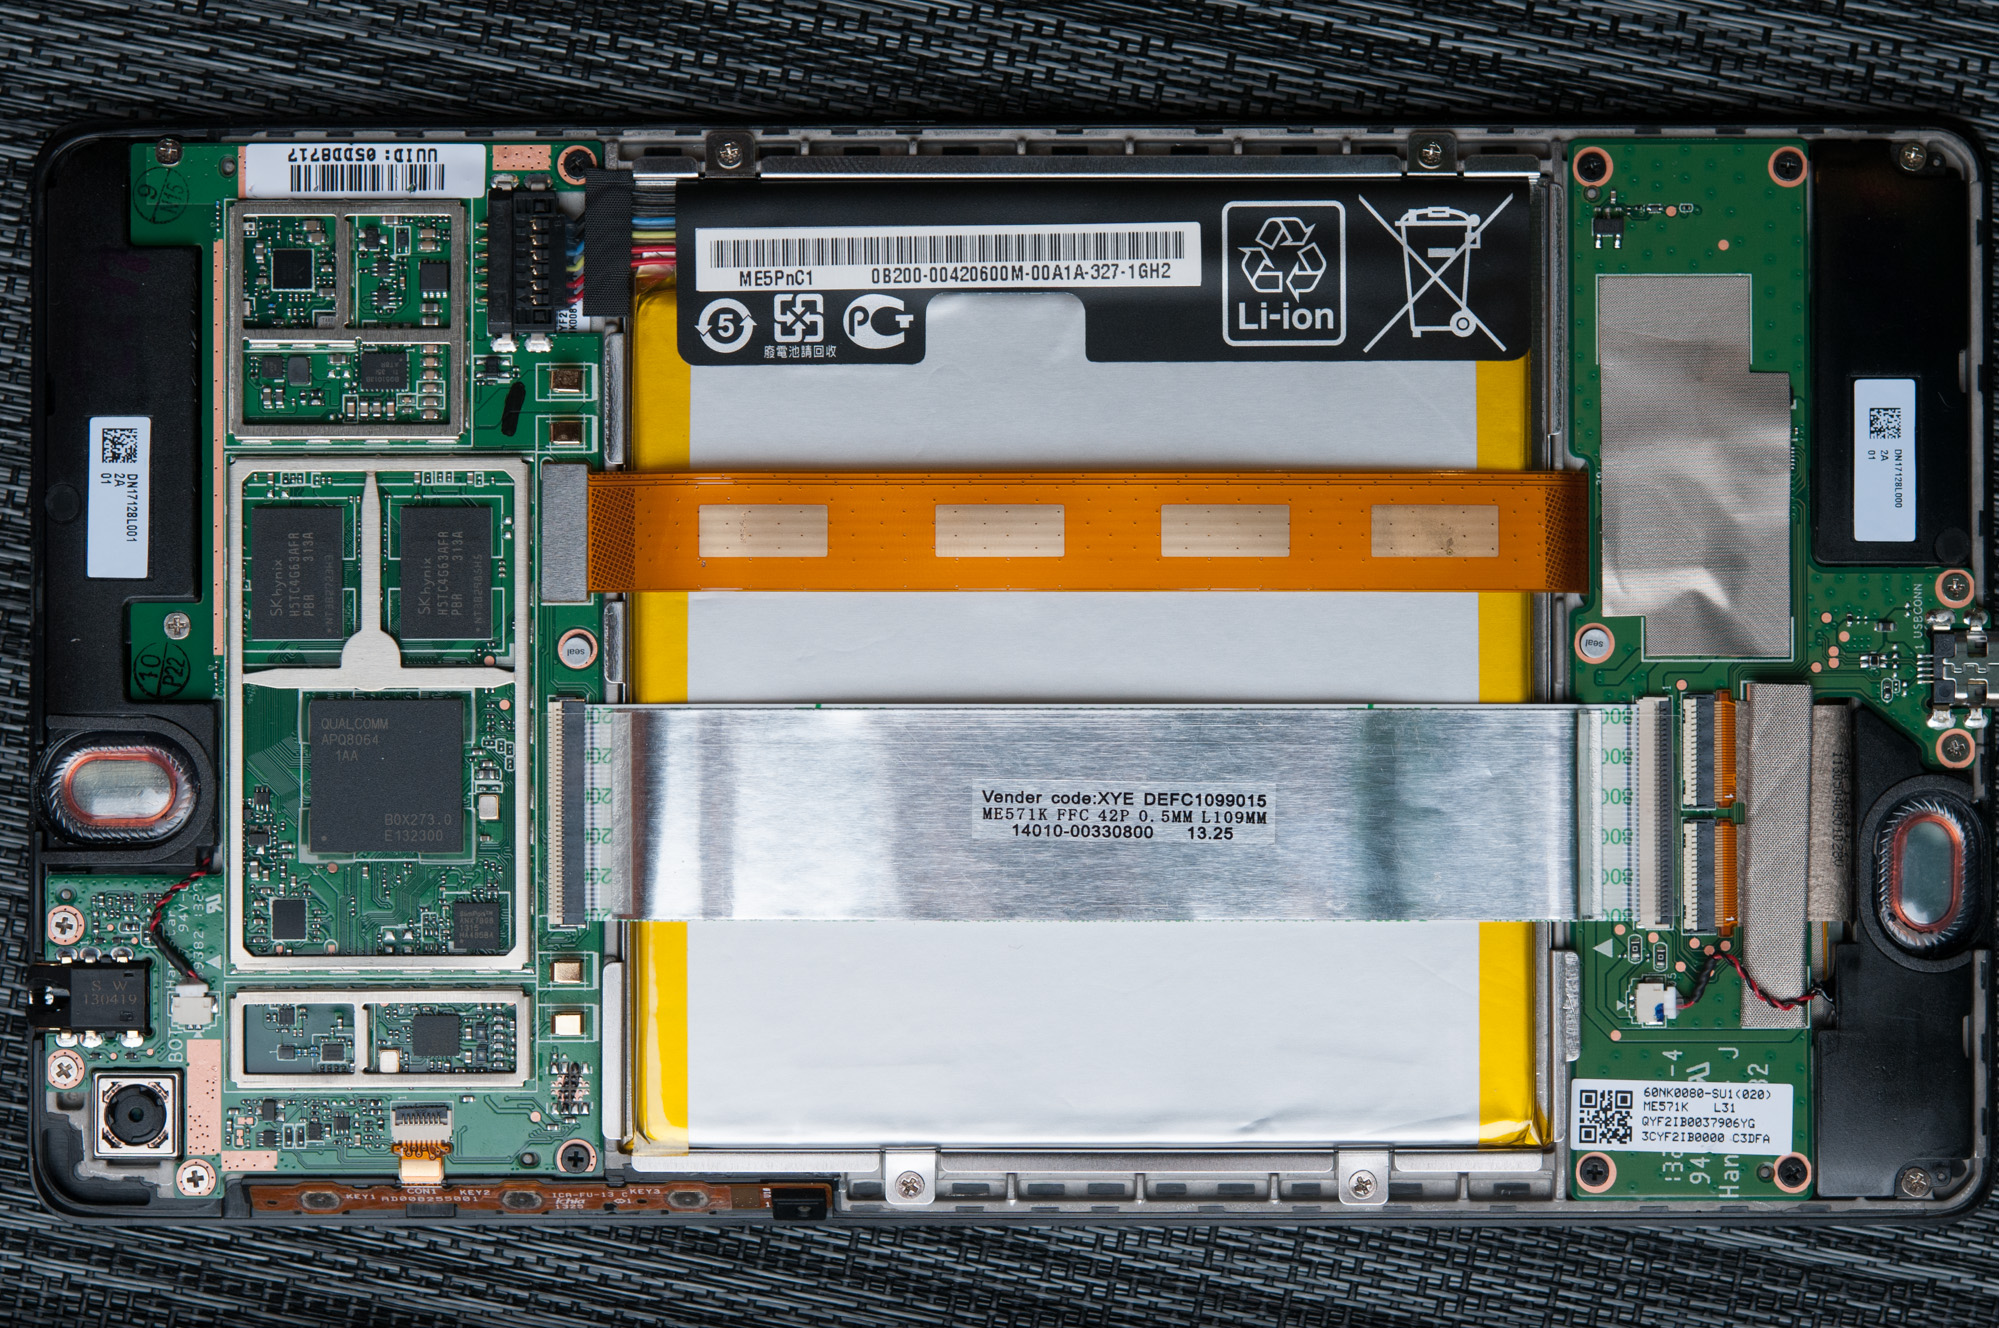 Performance and Storage Performance - Nexus 7 (2013) - Mini Review